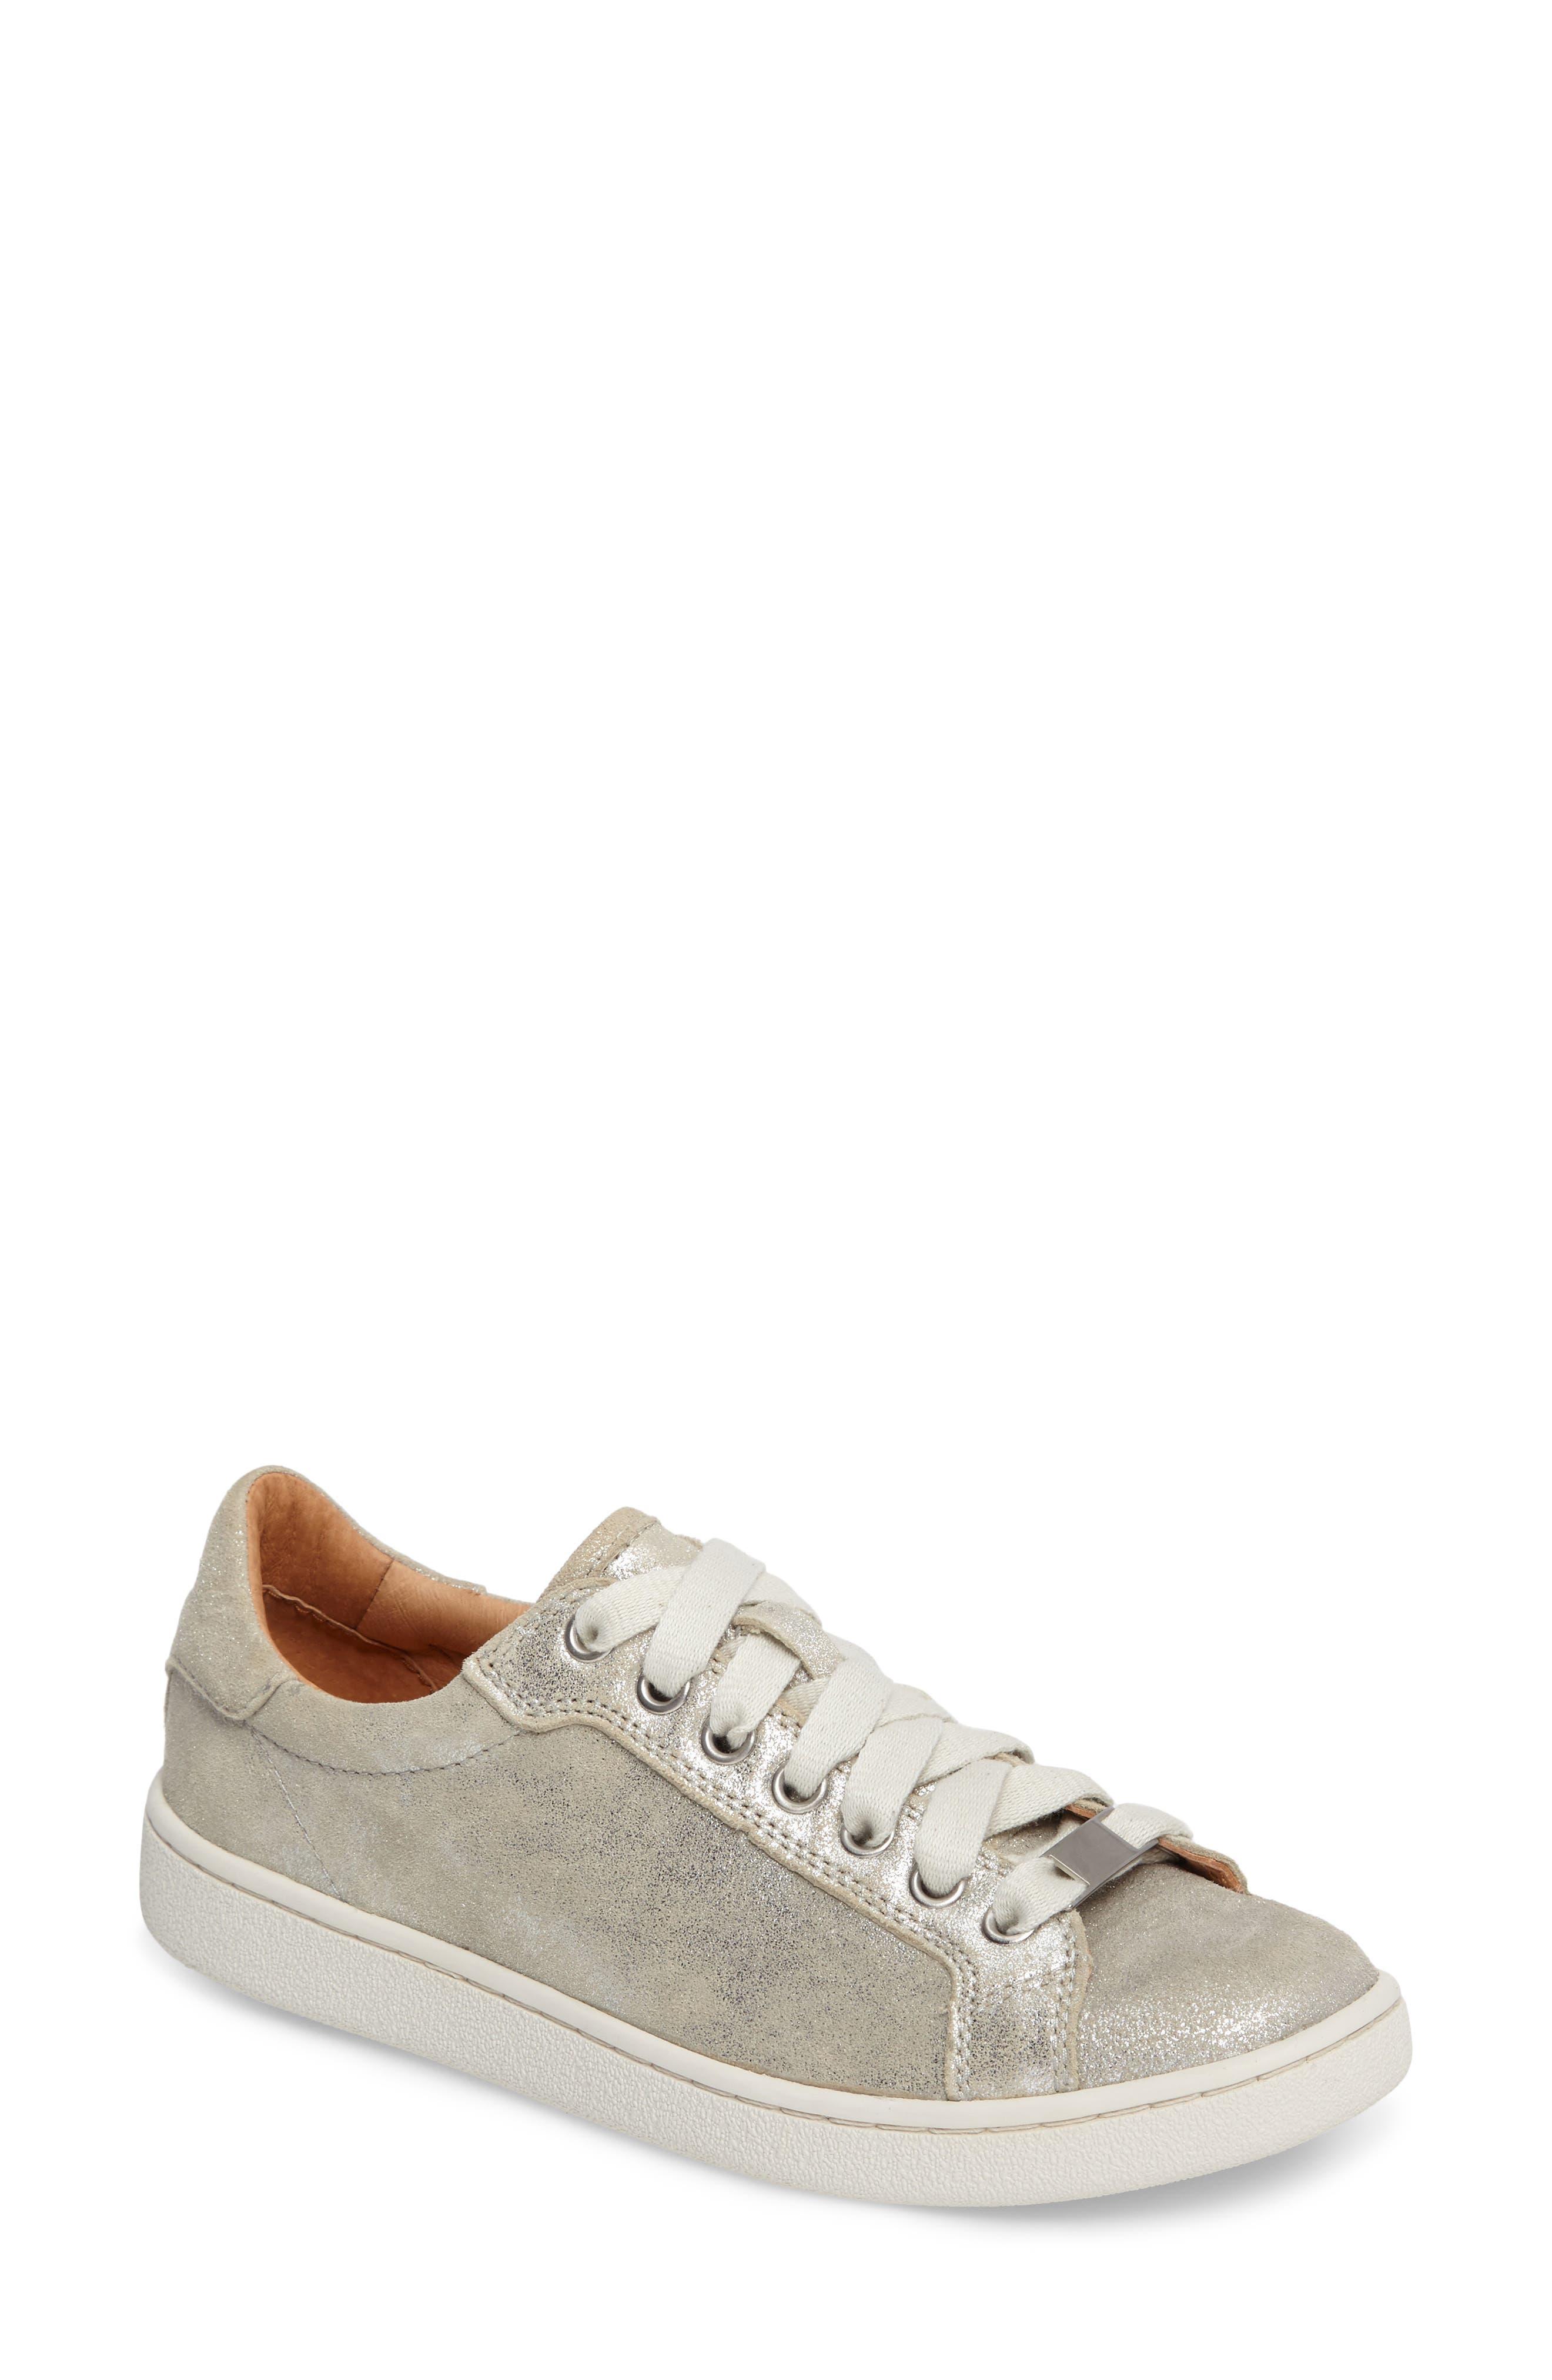 Milo Stardust Sneaker,                         Main,                         color,